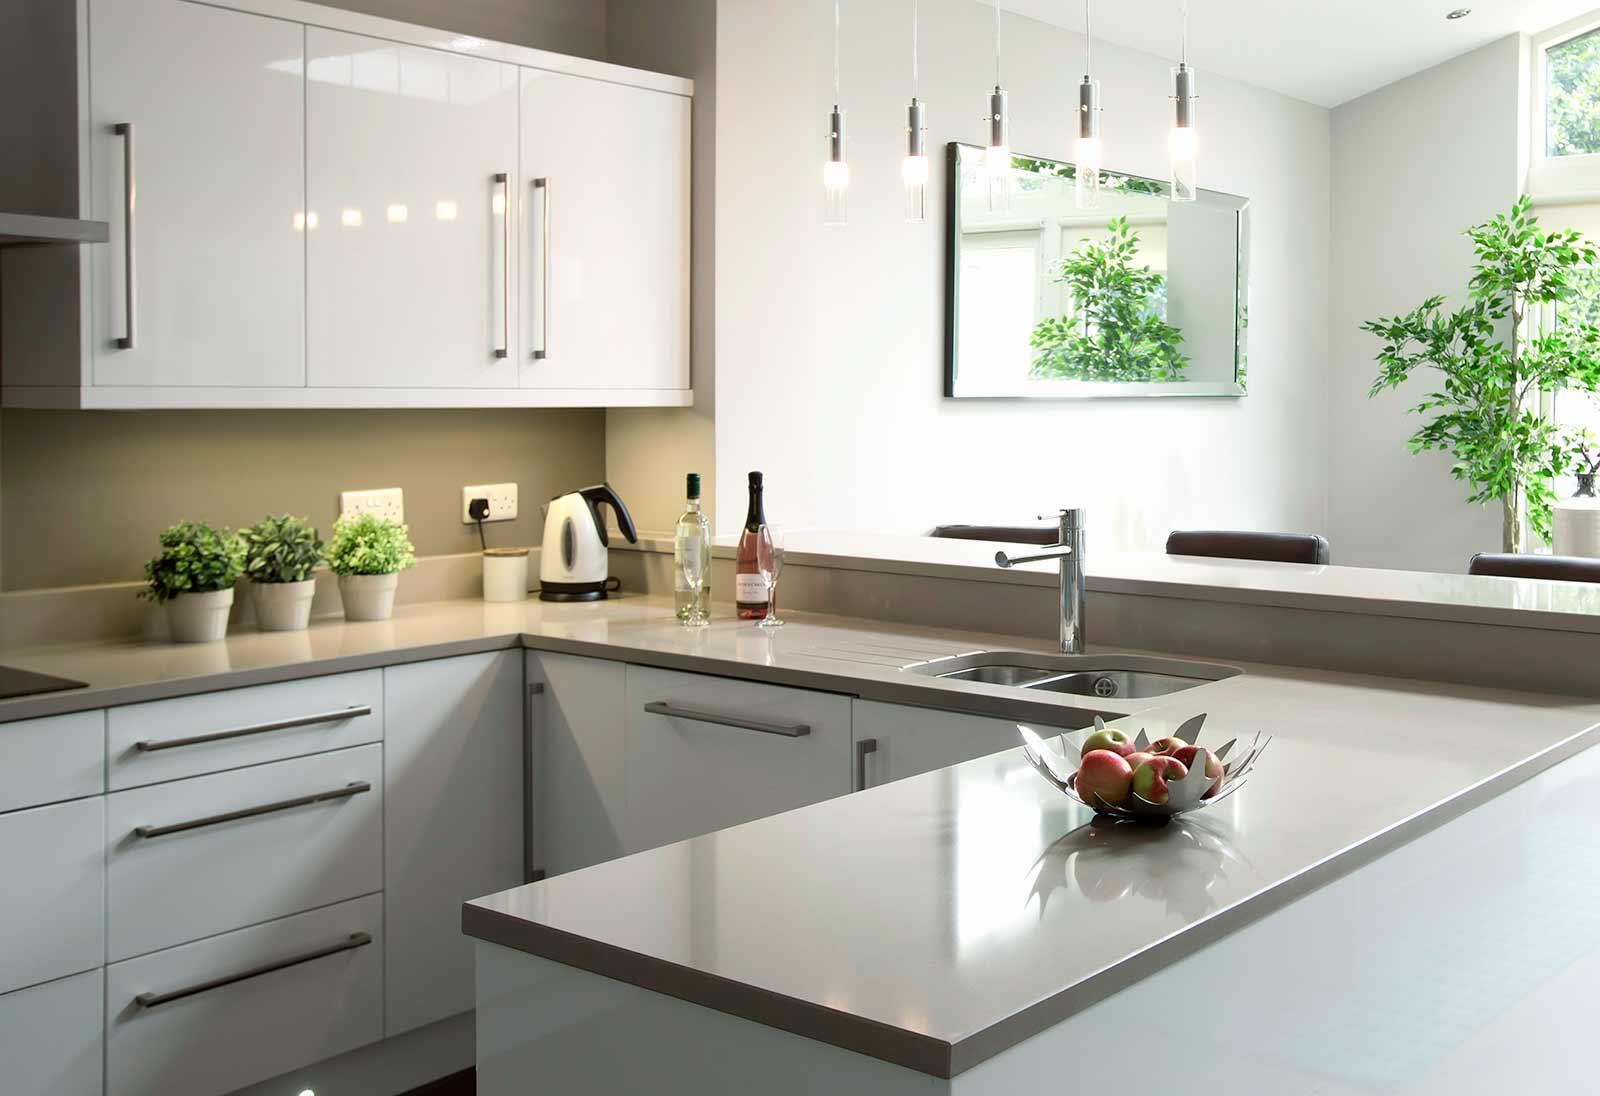 Carton-Interiors_P8_4_Open-plan-kitchen-living-room